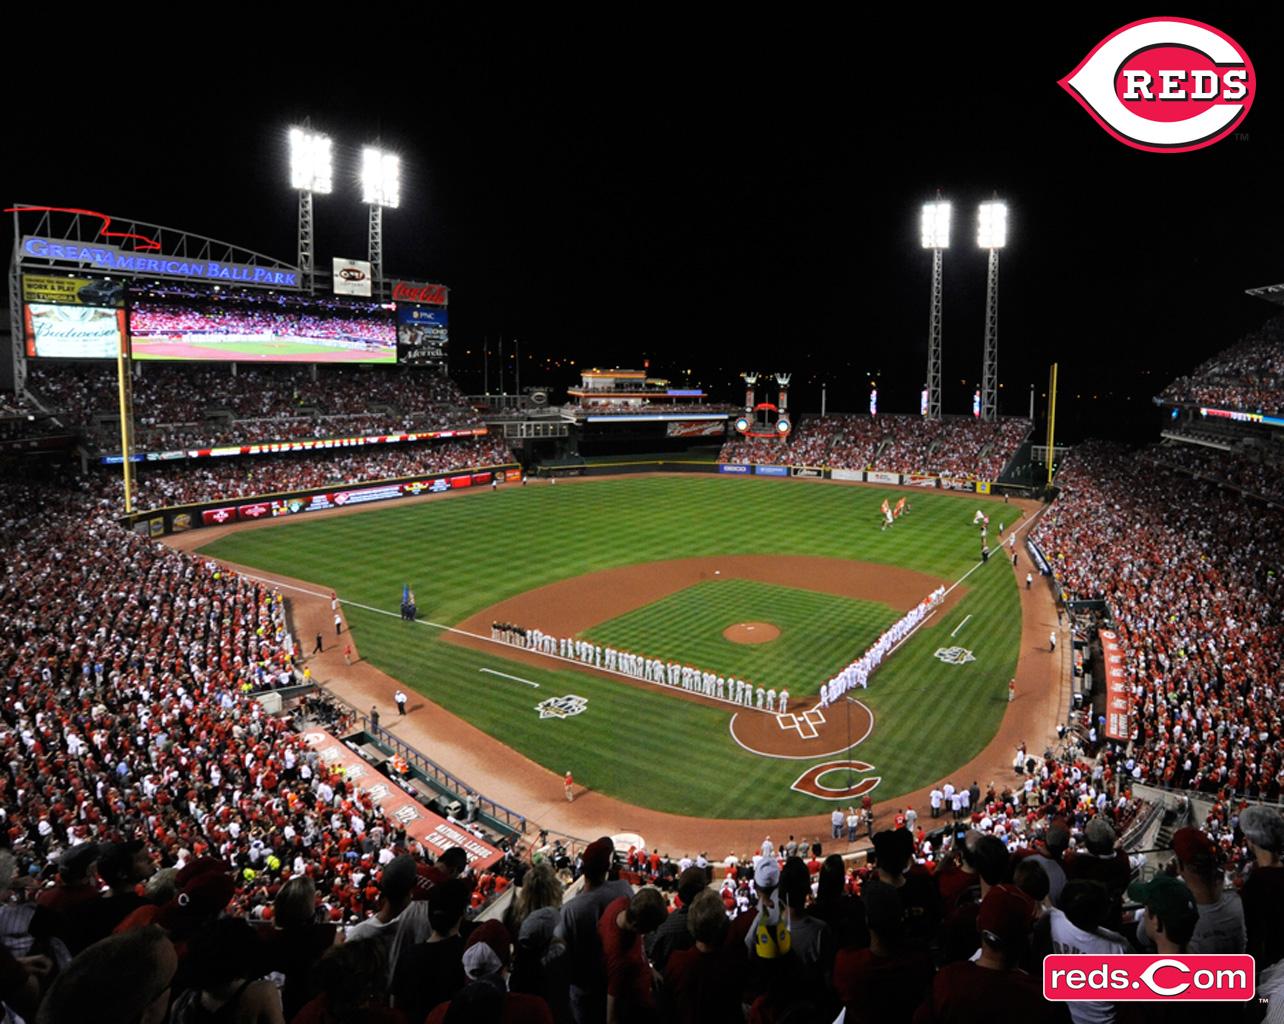 Cubs Reds 826 828 Jorge Soler Edition 1284x1024